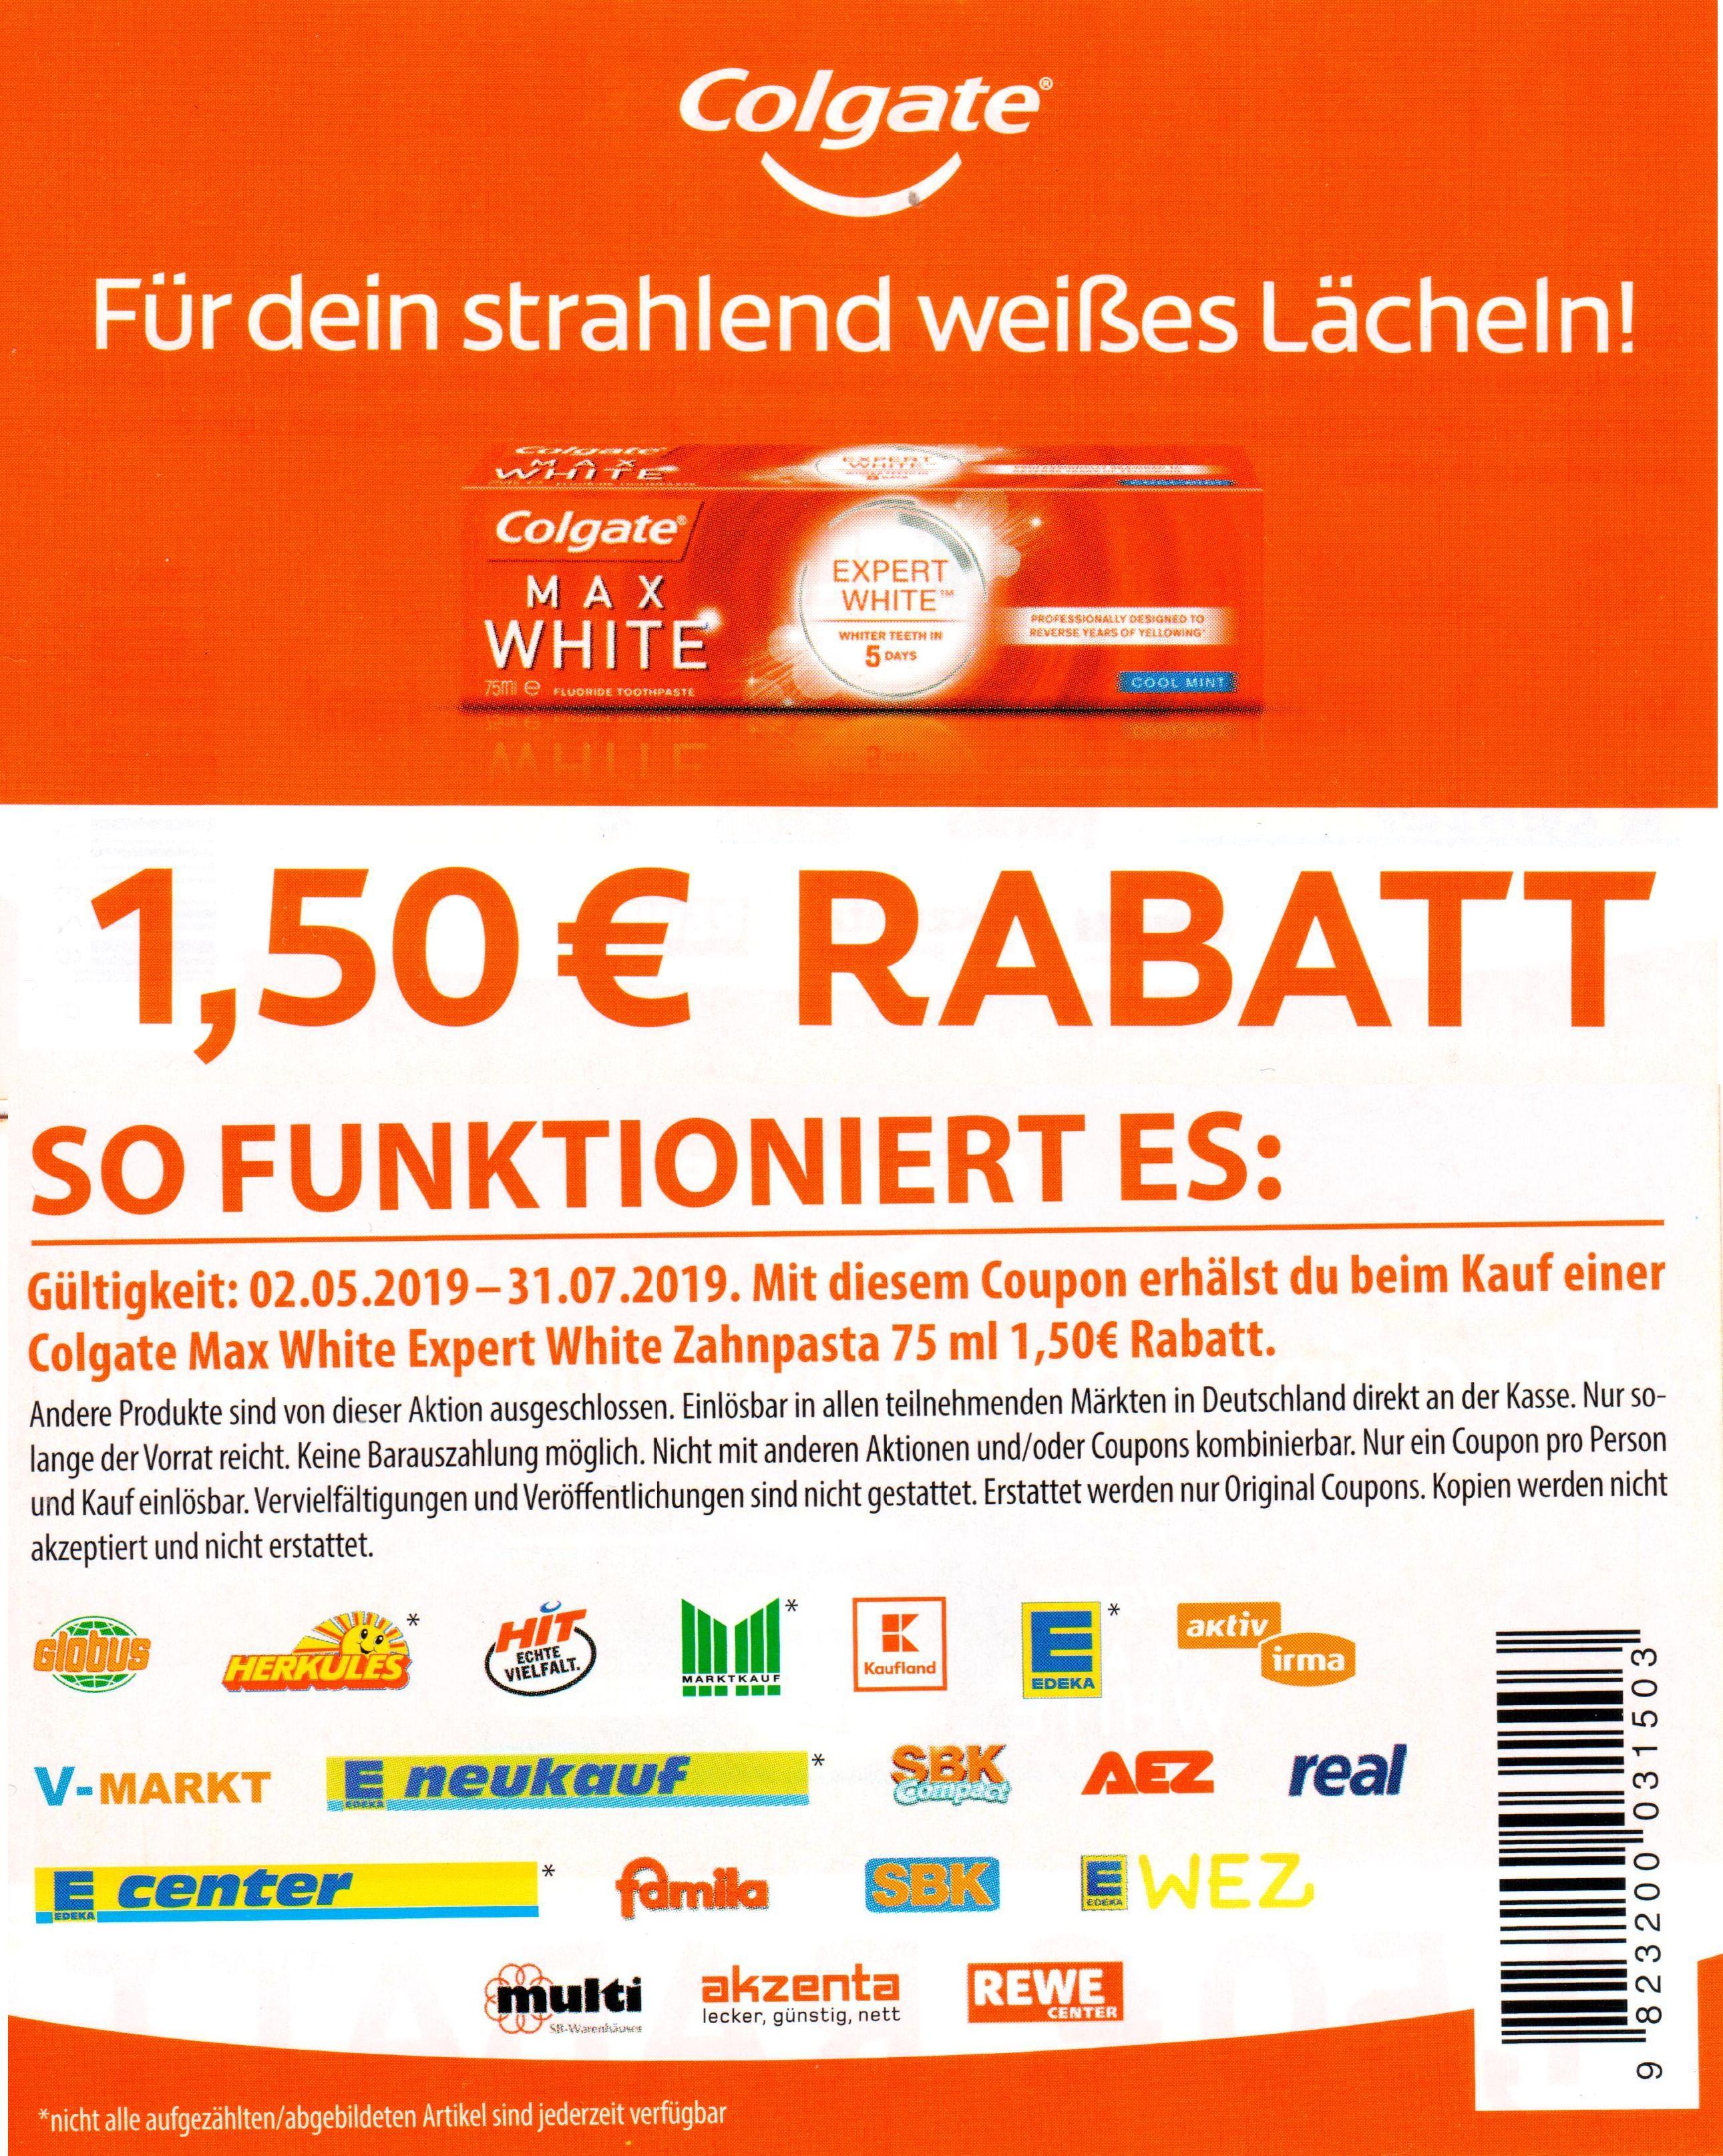 1,50€ Sofort-Rabatt Coupon für Colgate Max White Expert bis 31.07.2019